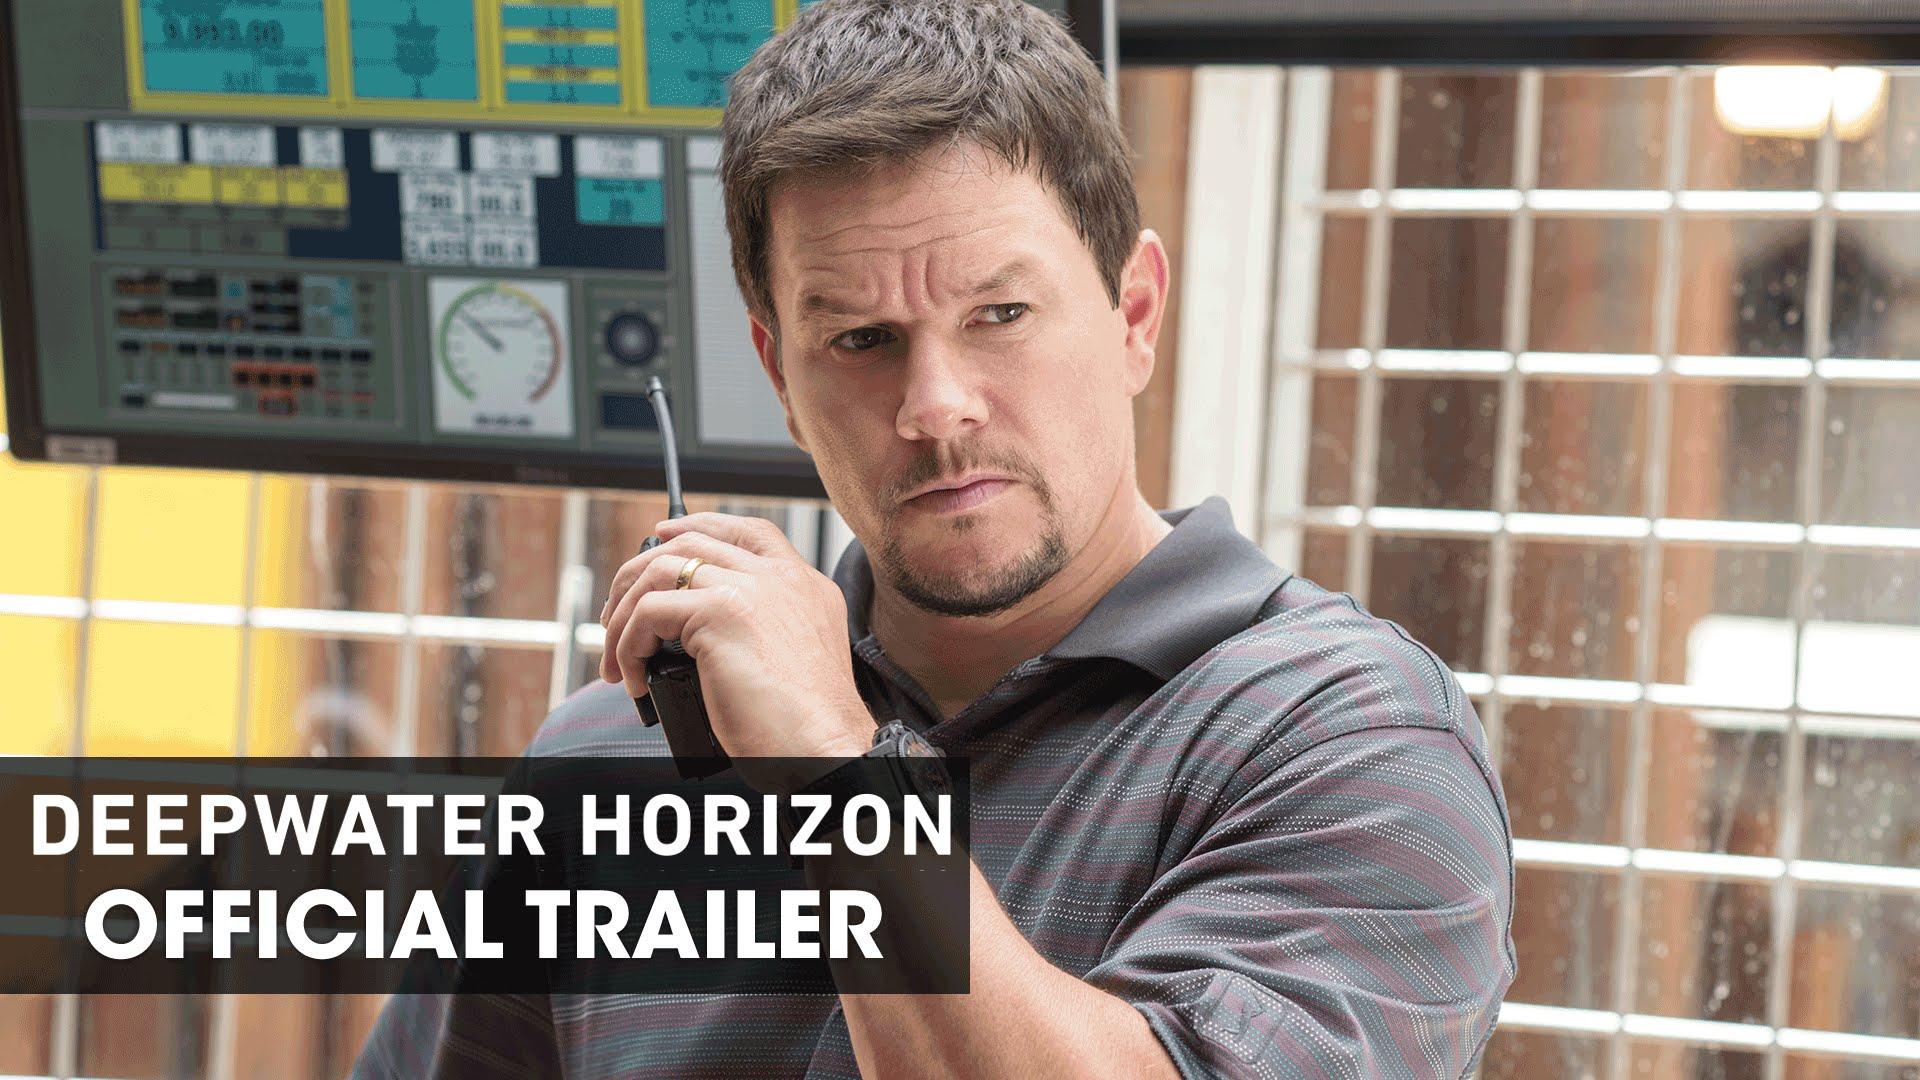 Deepwater Horizon (2016) Official Movie Trailer – 'Courage'